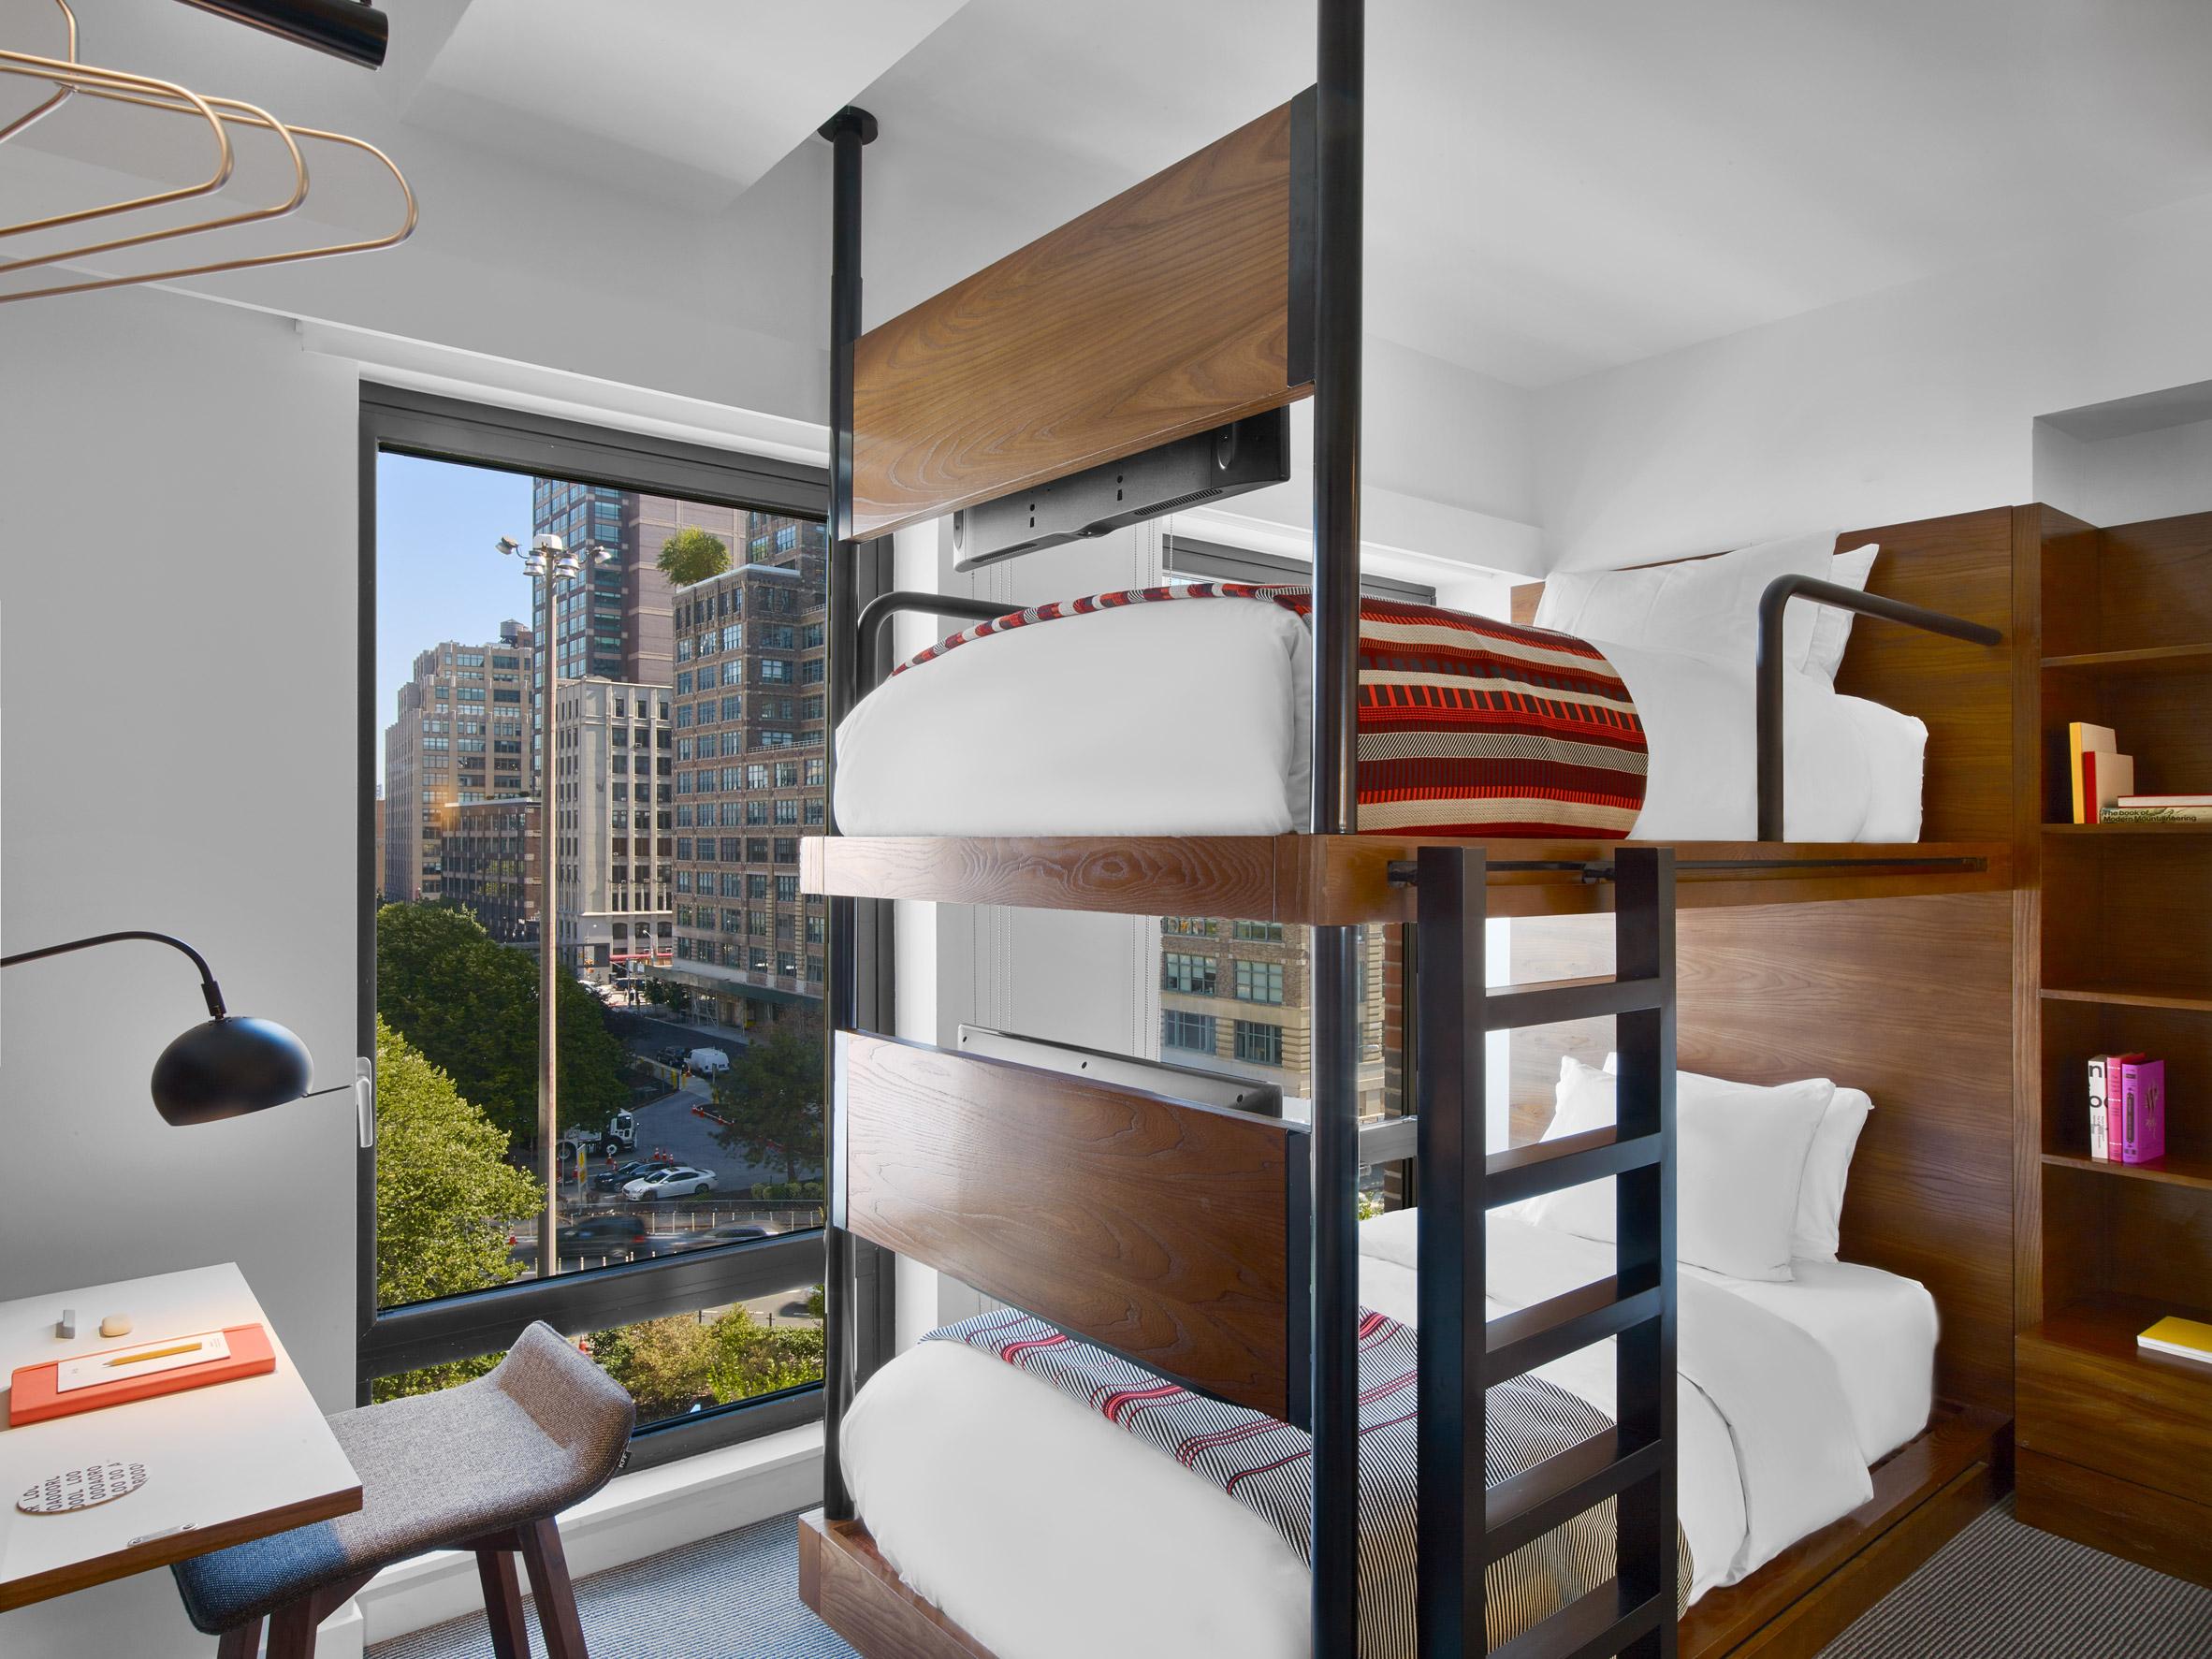 architecture-new-york-city-micro-hotel-design-studia-interiors-osnovadesign-osnova-poltava_04